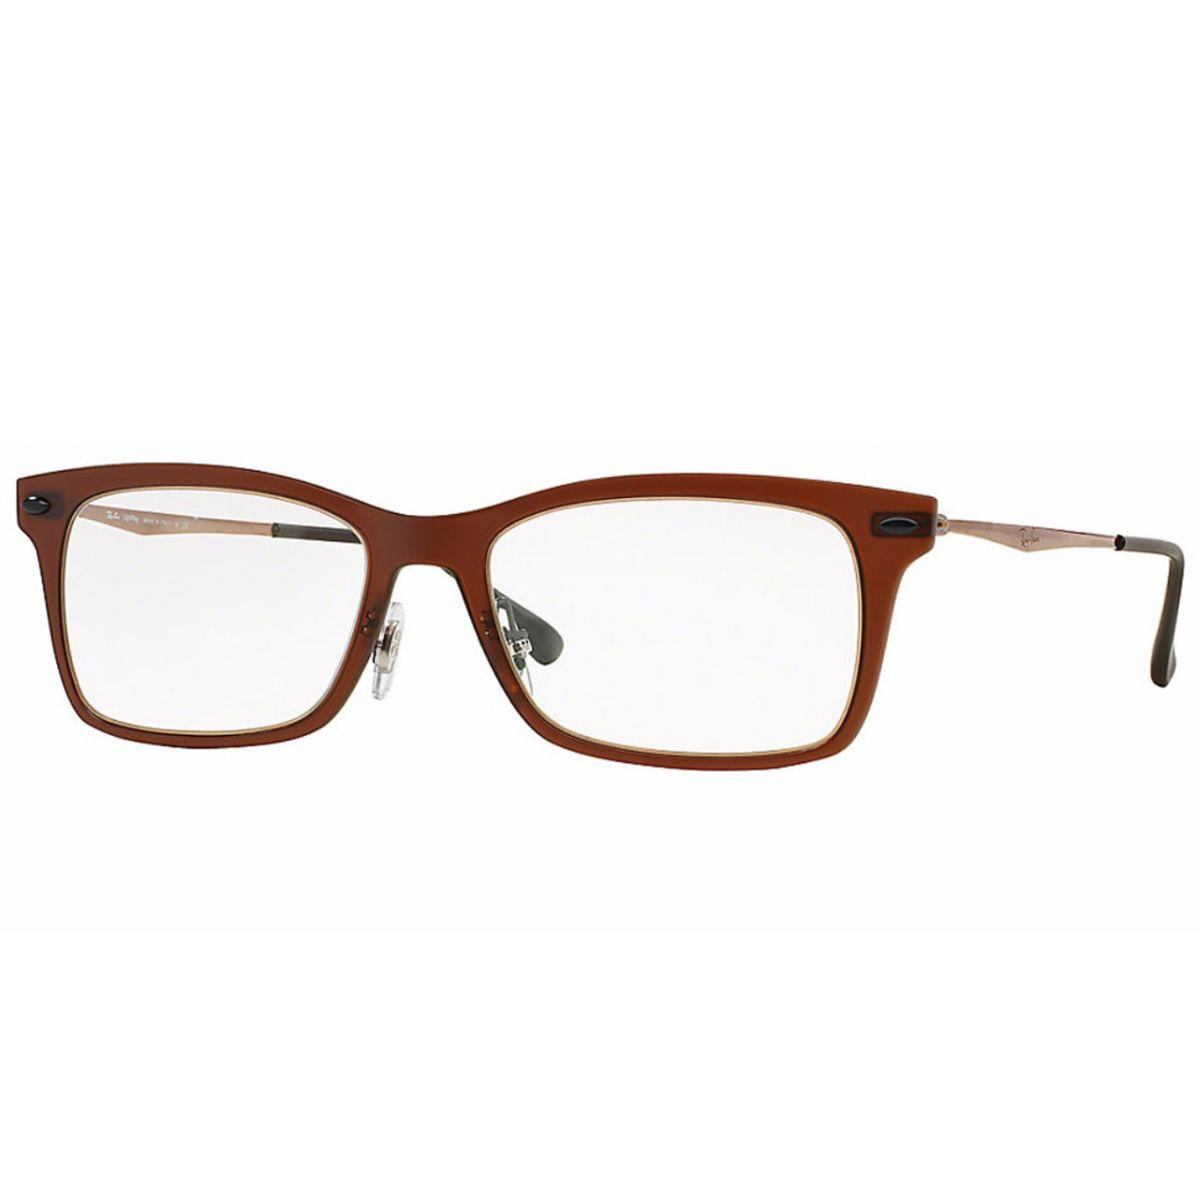 Óculos De Grau Light Ray Titânio Ray Ban RB7039 5450 Tam.51 - Ray ban  original - Óculos de grau - Magazine Luiza de6f42abe6